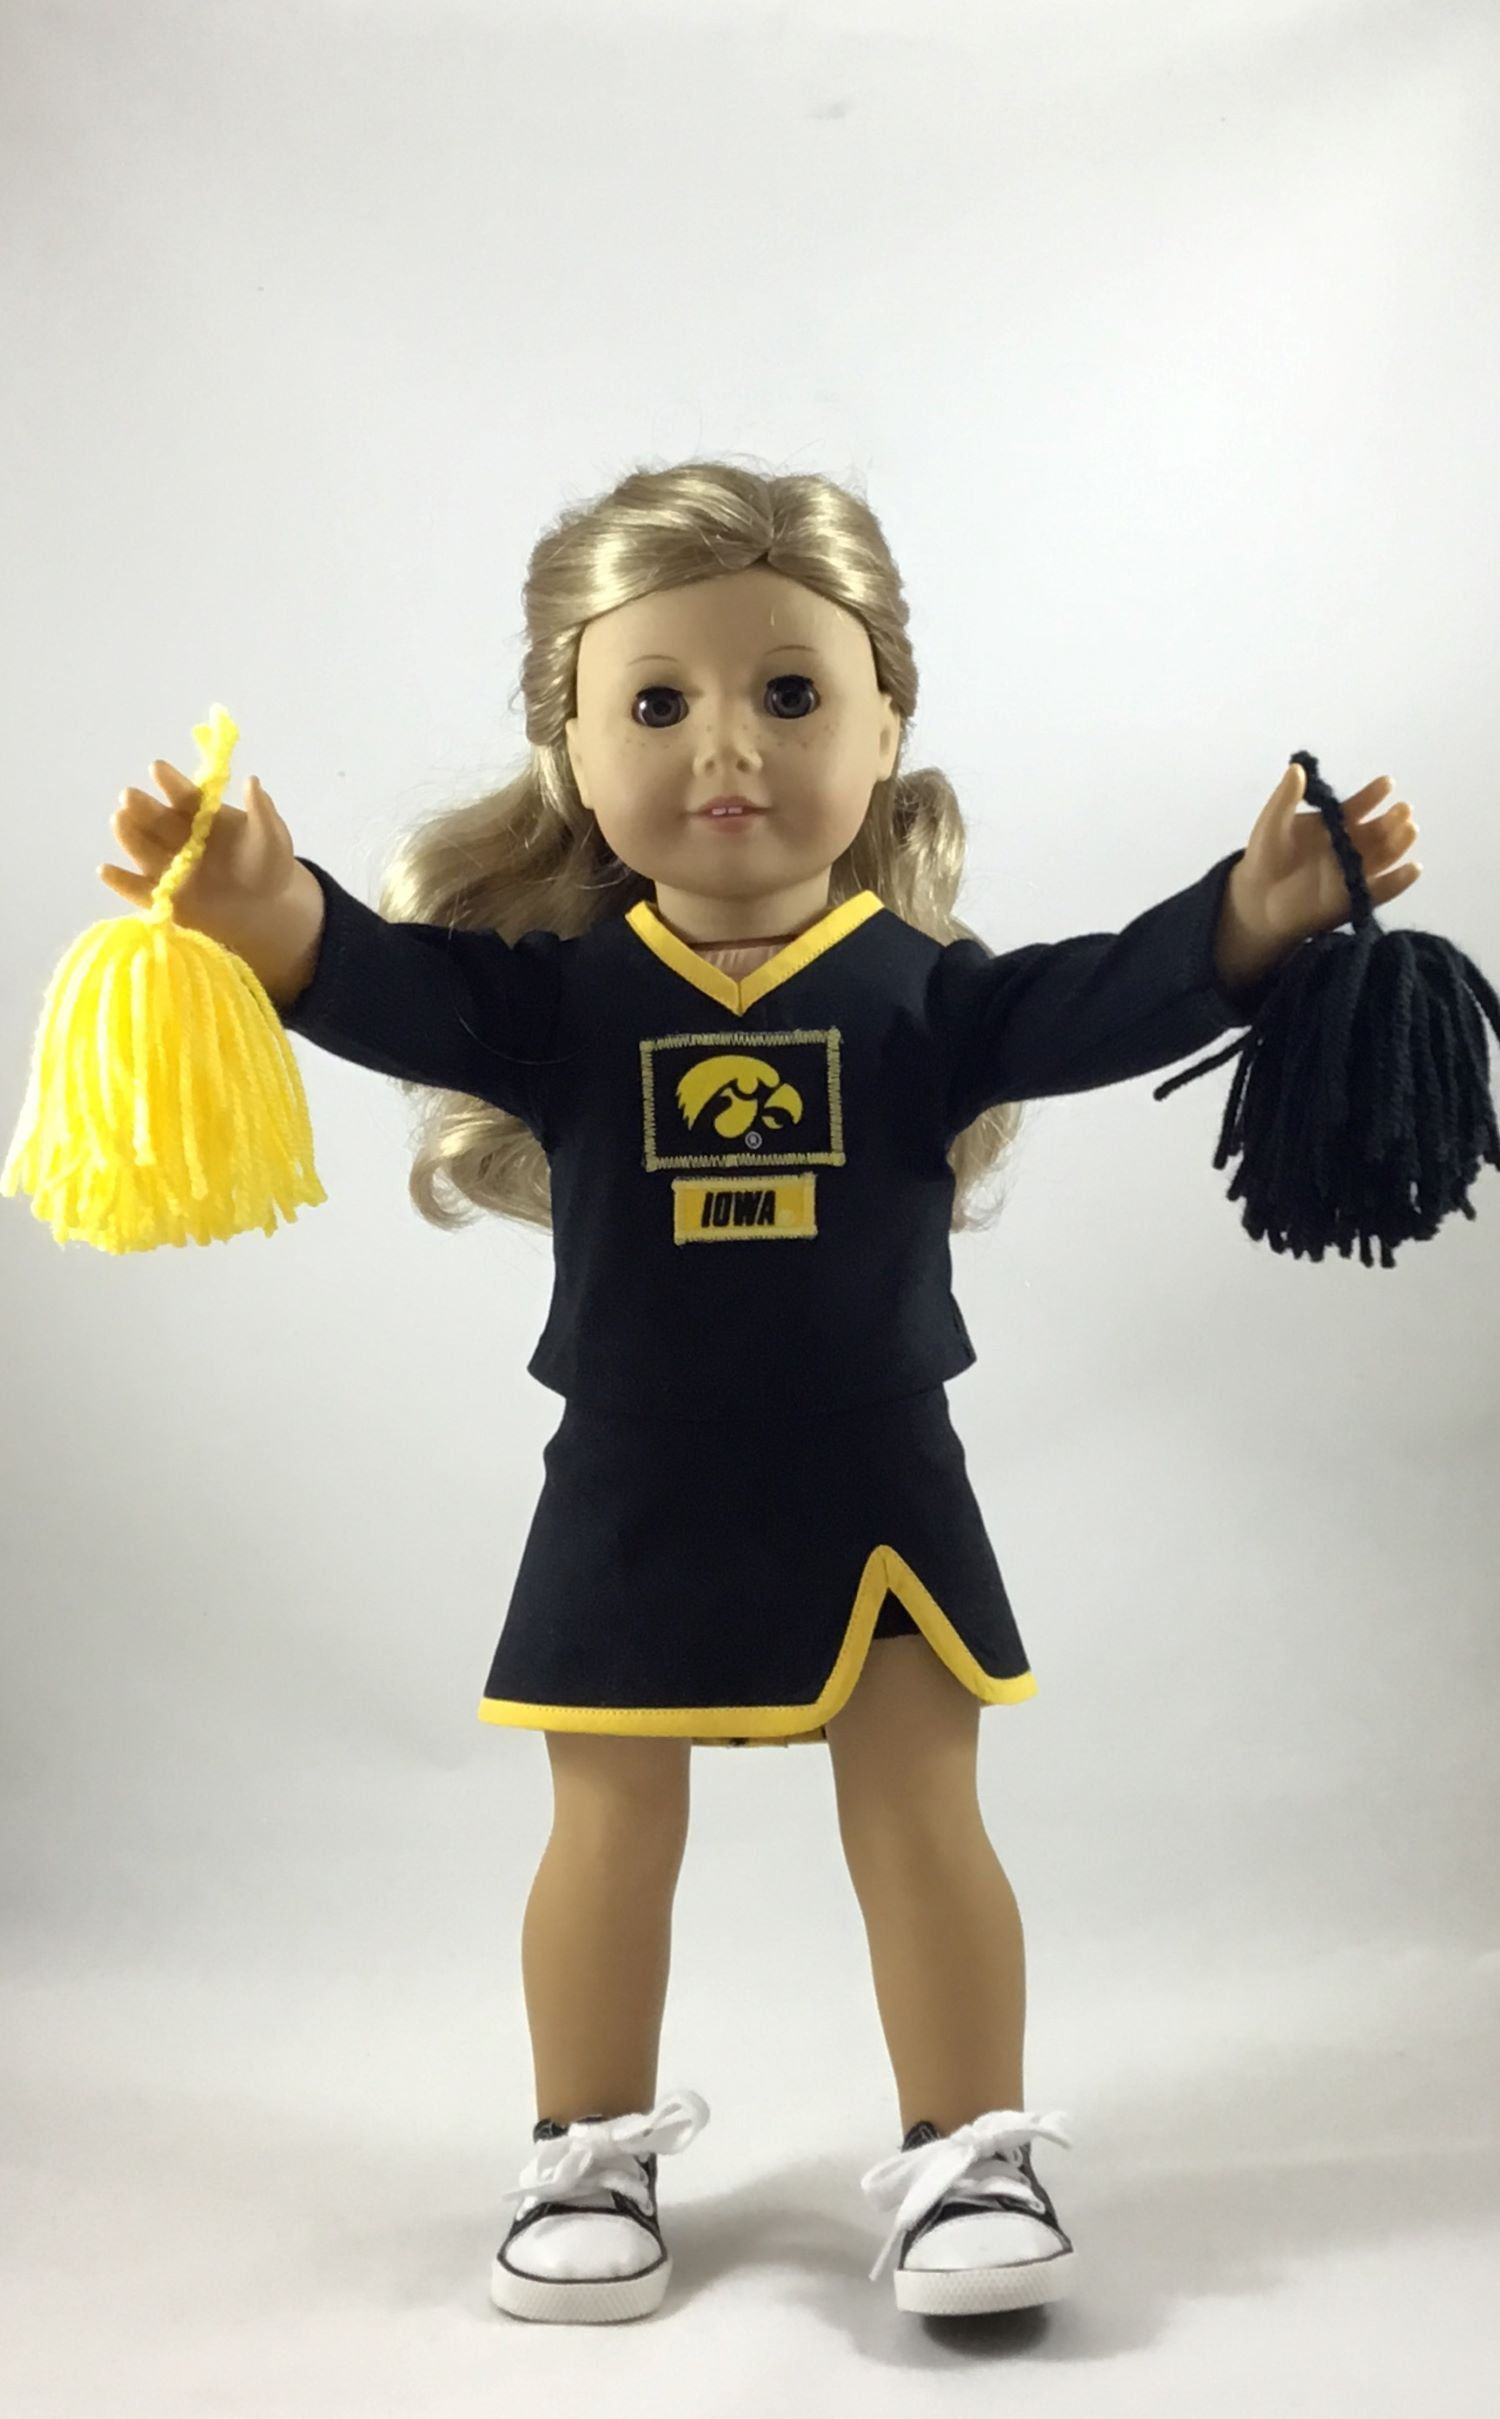 Iowa Hawkeye Cheerleading Uniform made to fit 18 dolls #18inchcheerleaderclothes Iowa Hawkeye Cheerleading Uniform made to fit 18 dolls by ILuvmCreations on Etsy #18inchcheerleaderclothes